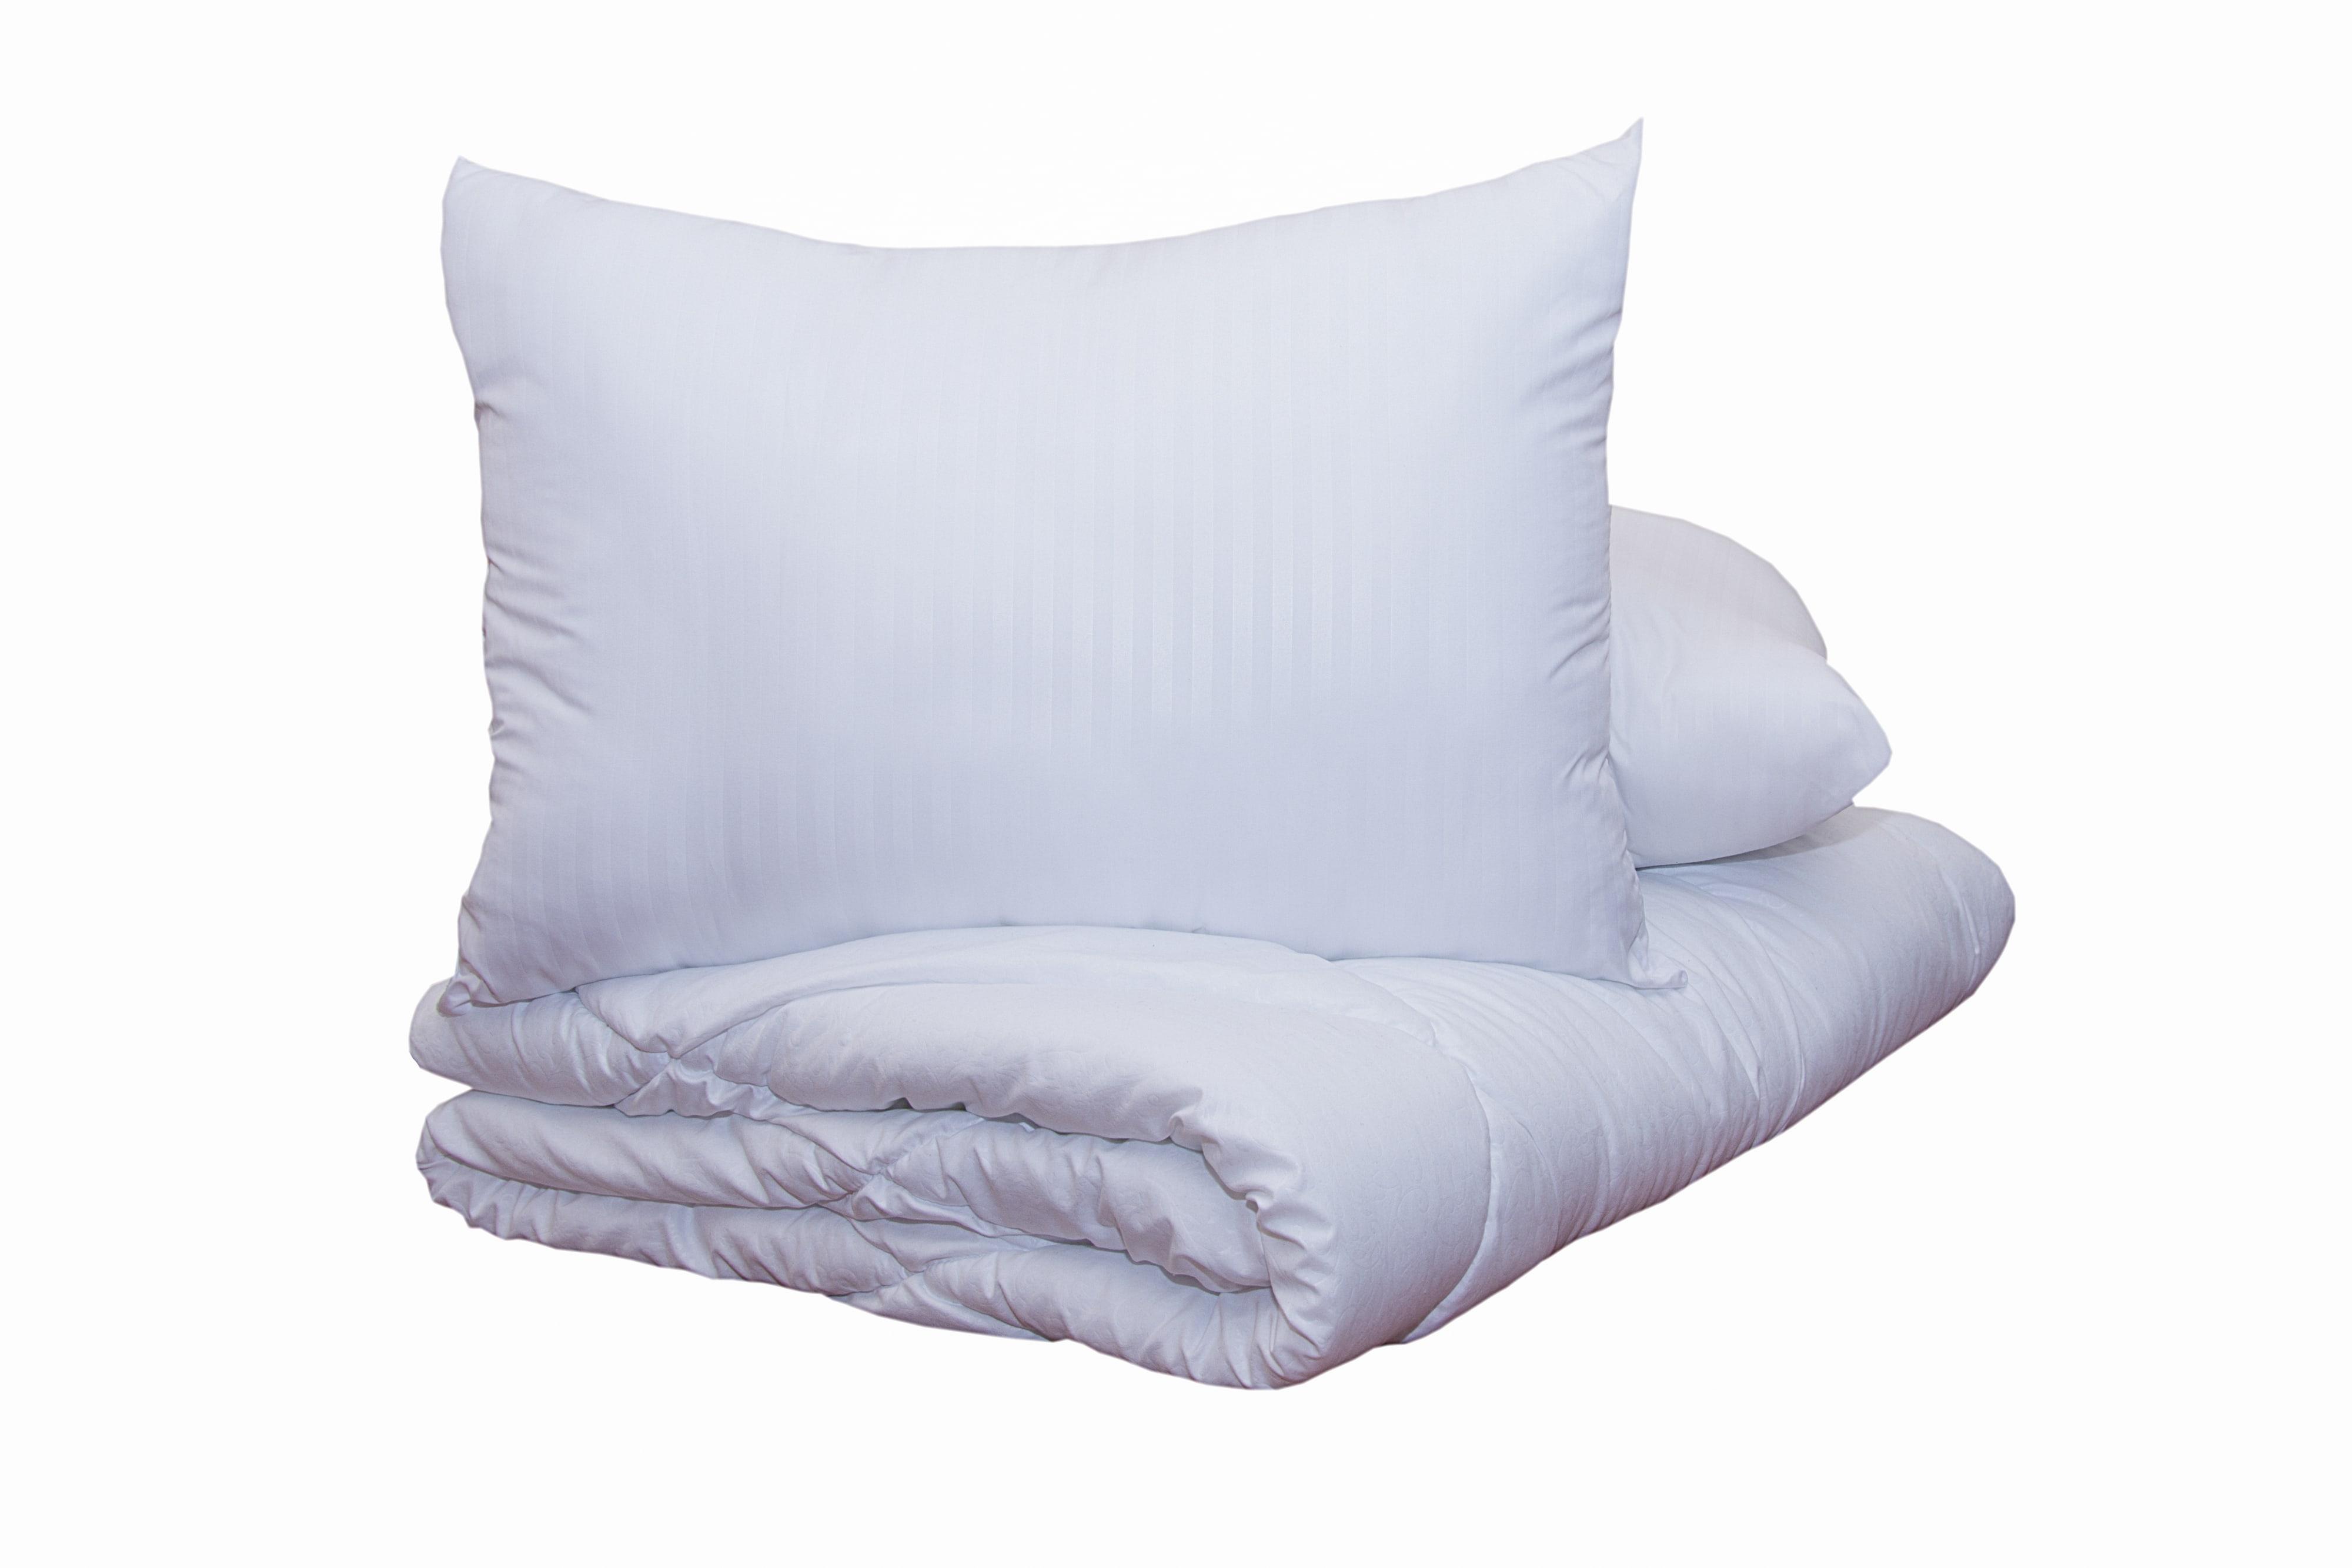 Filled_Duvet_Pillows_-min.jpg